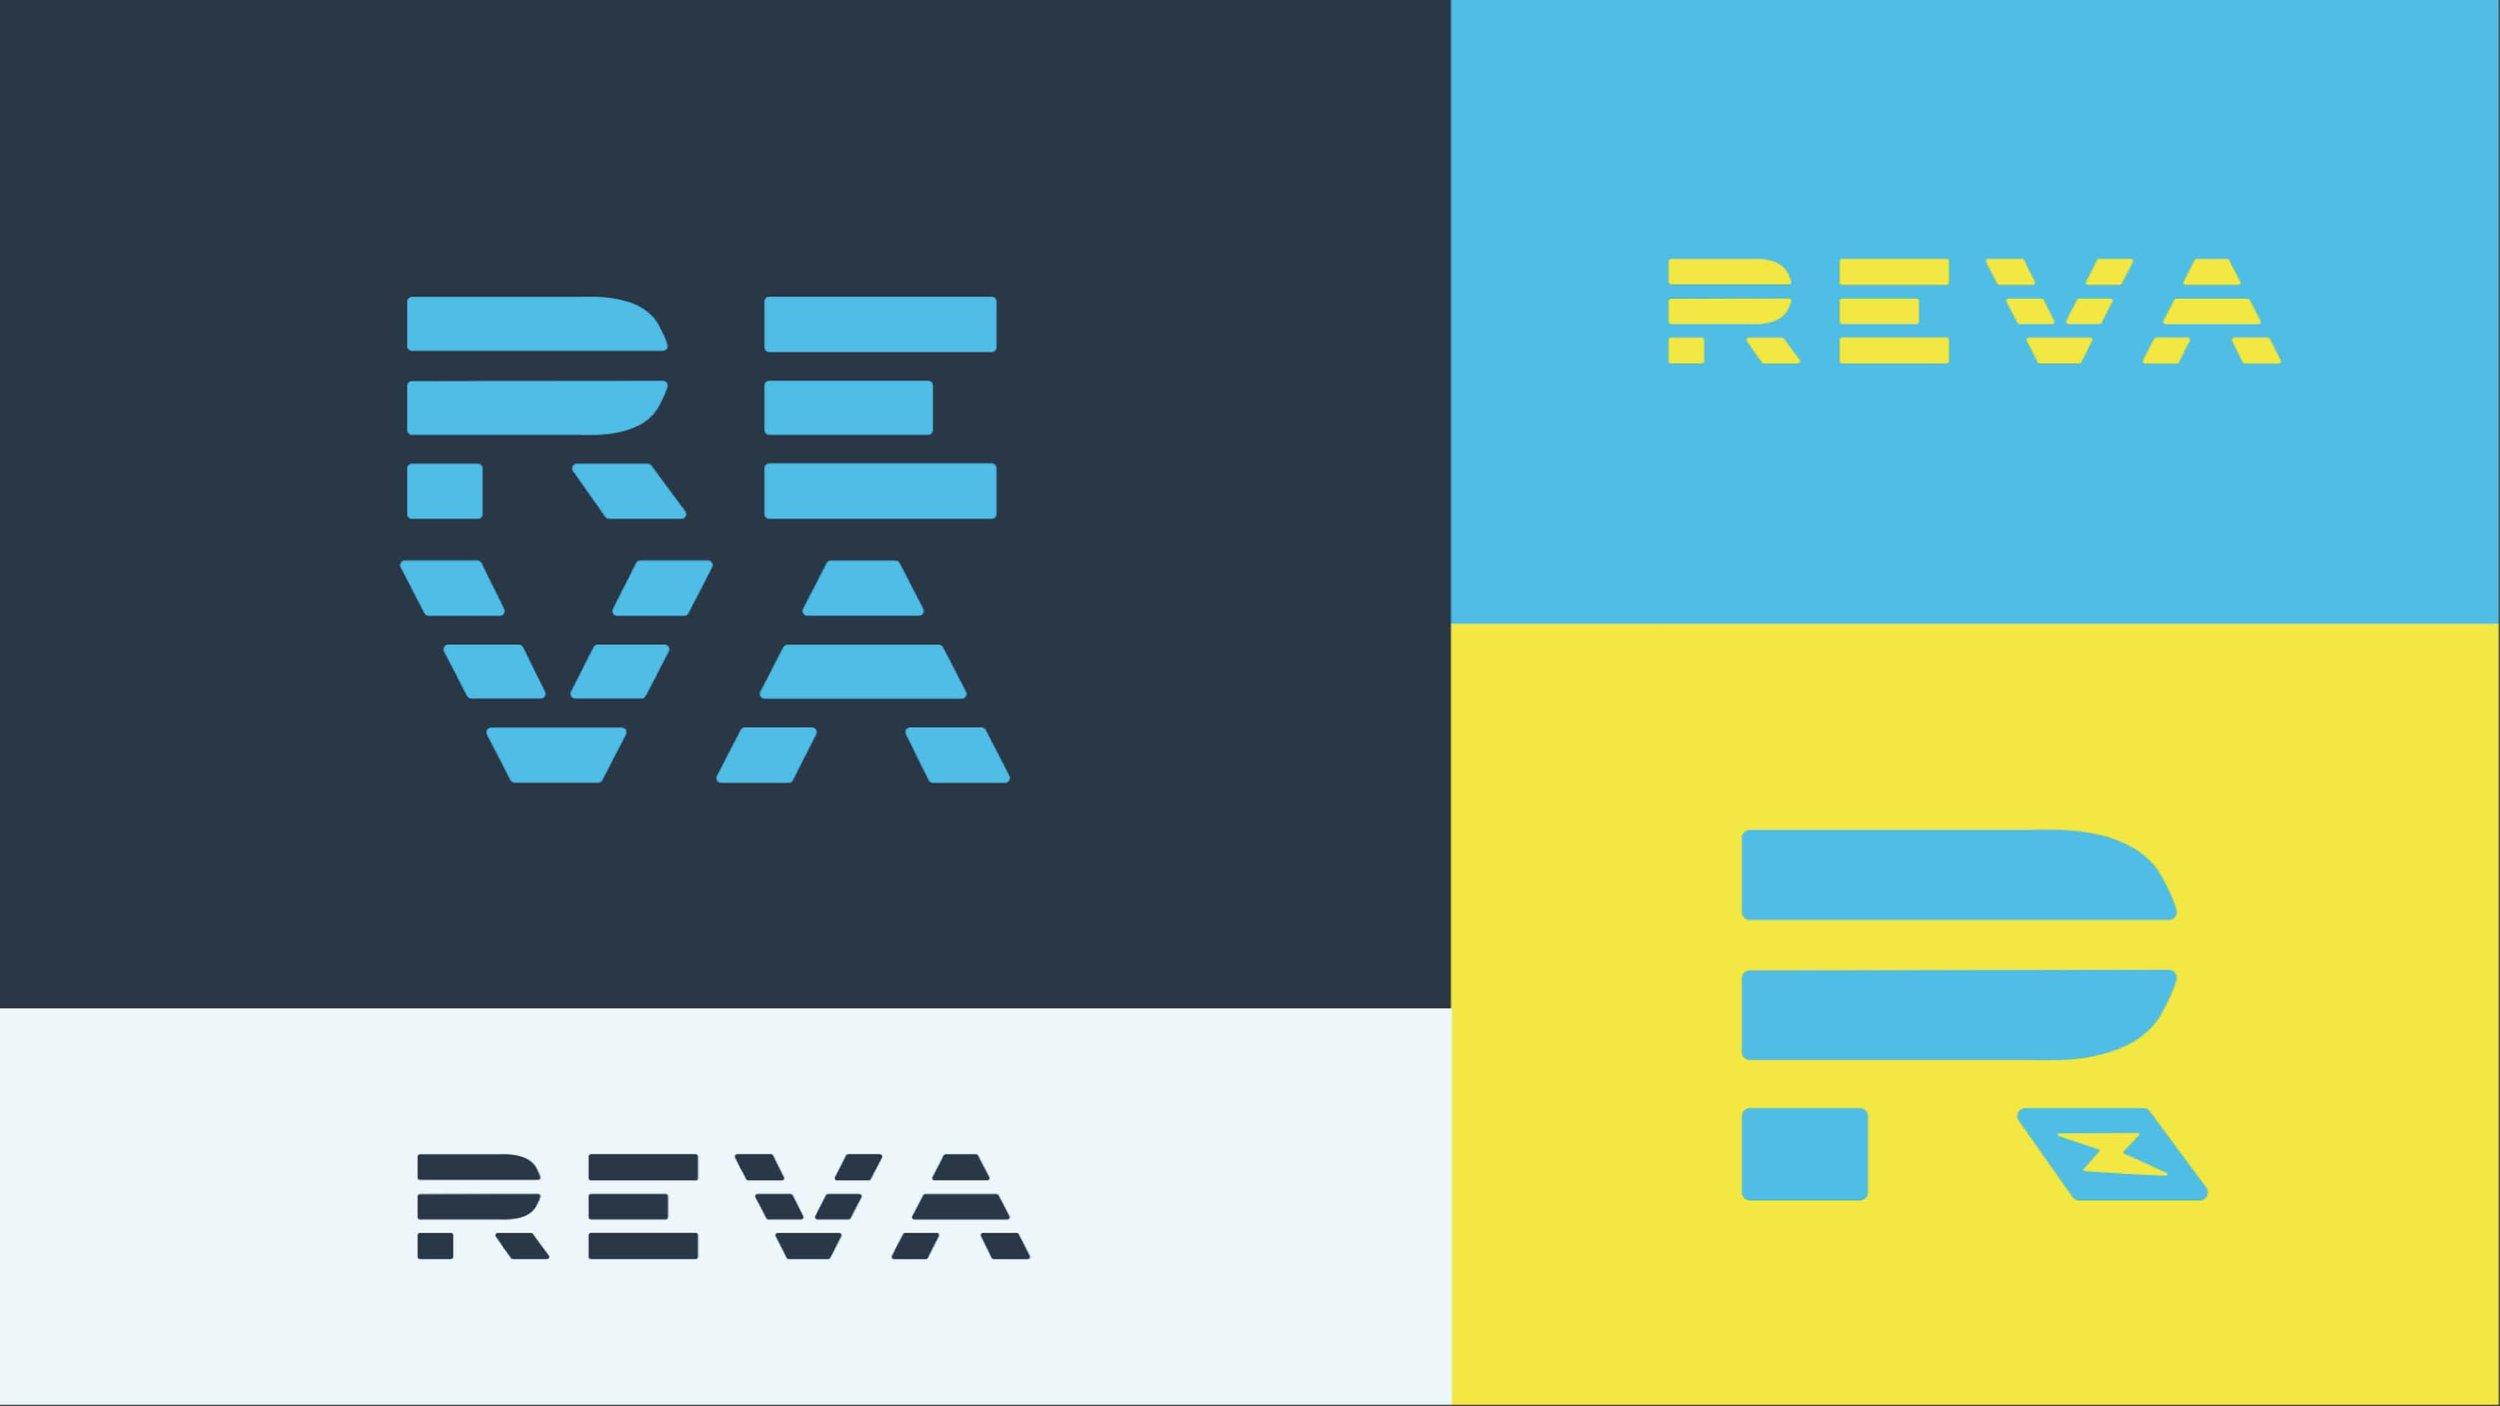 Reva_Demo Day Pitch Deck_08162018_Page_01.jpg